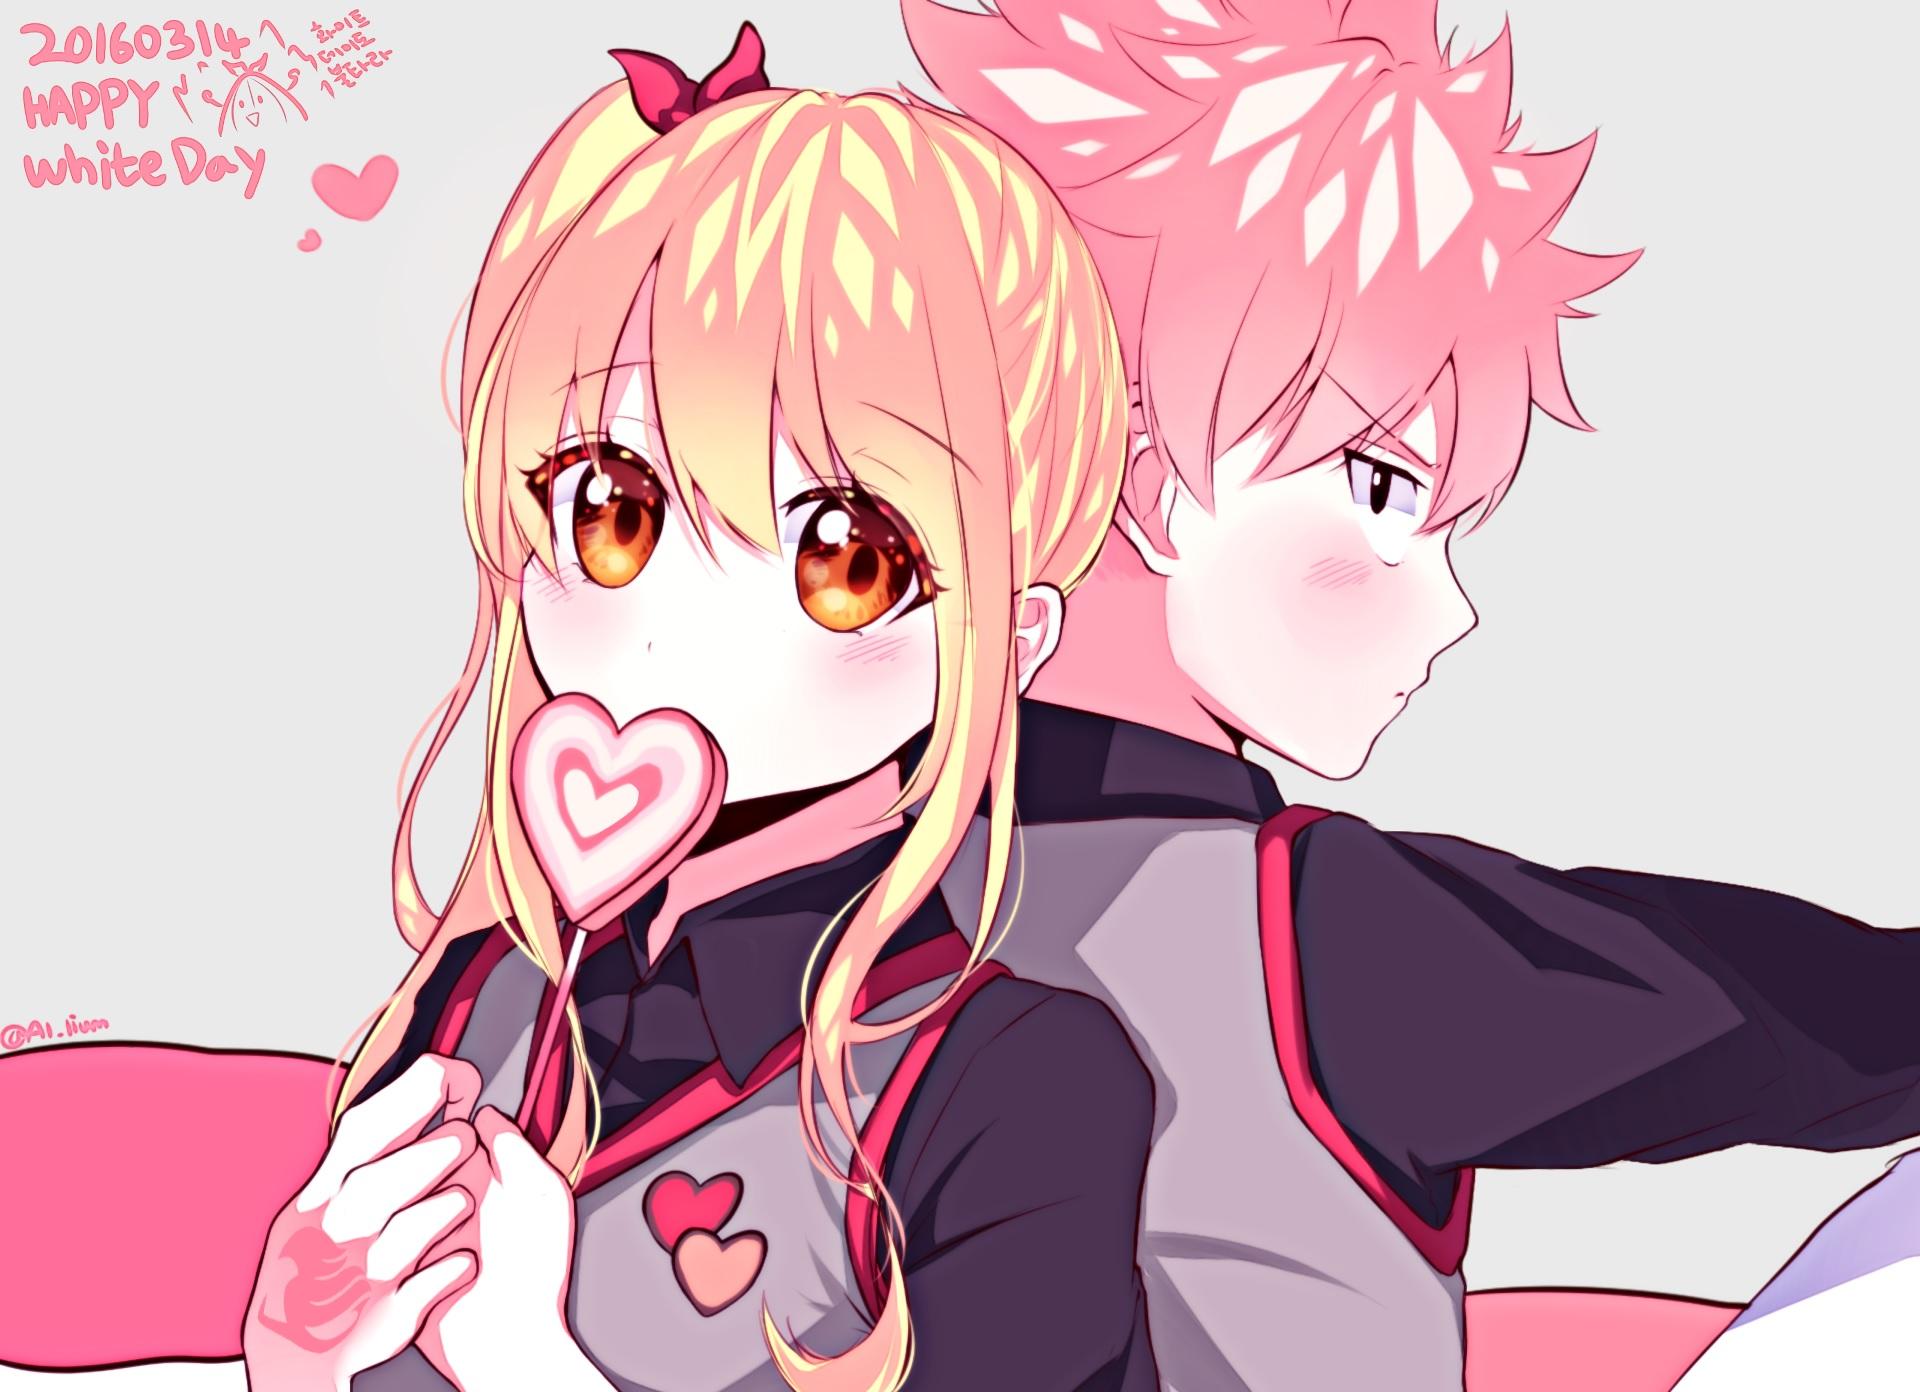 Natsu Dragneel X Lucy Heartfillia wallpaper